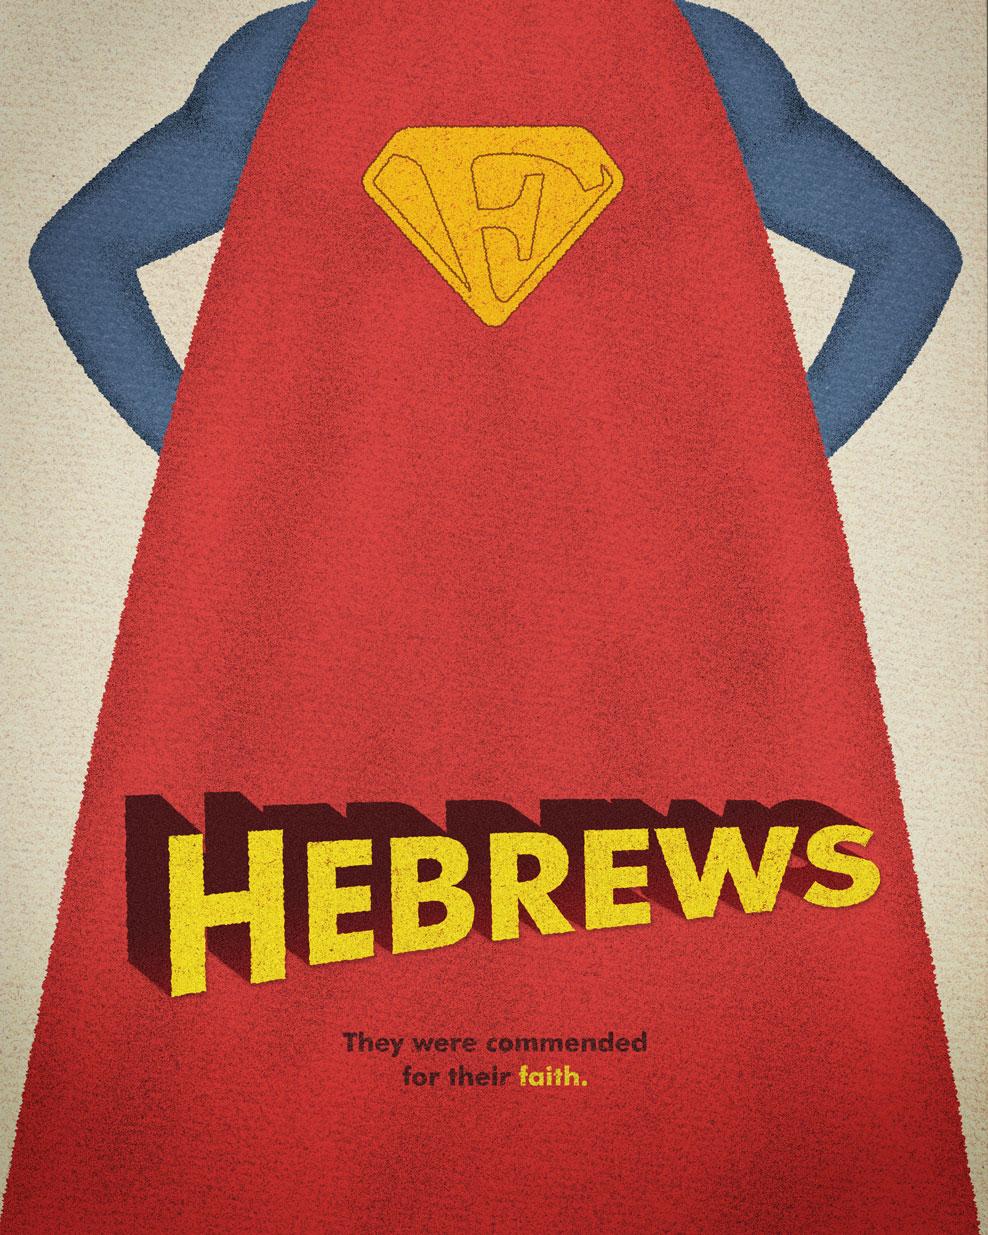 58-Hebrews_988.jpg